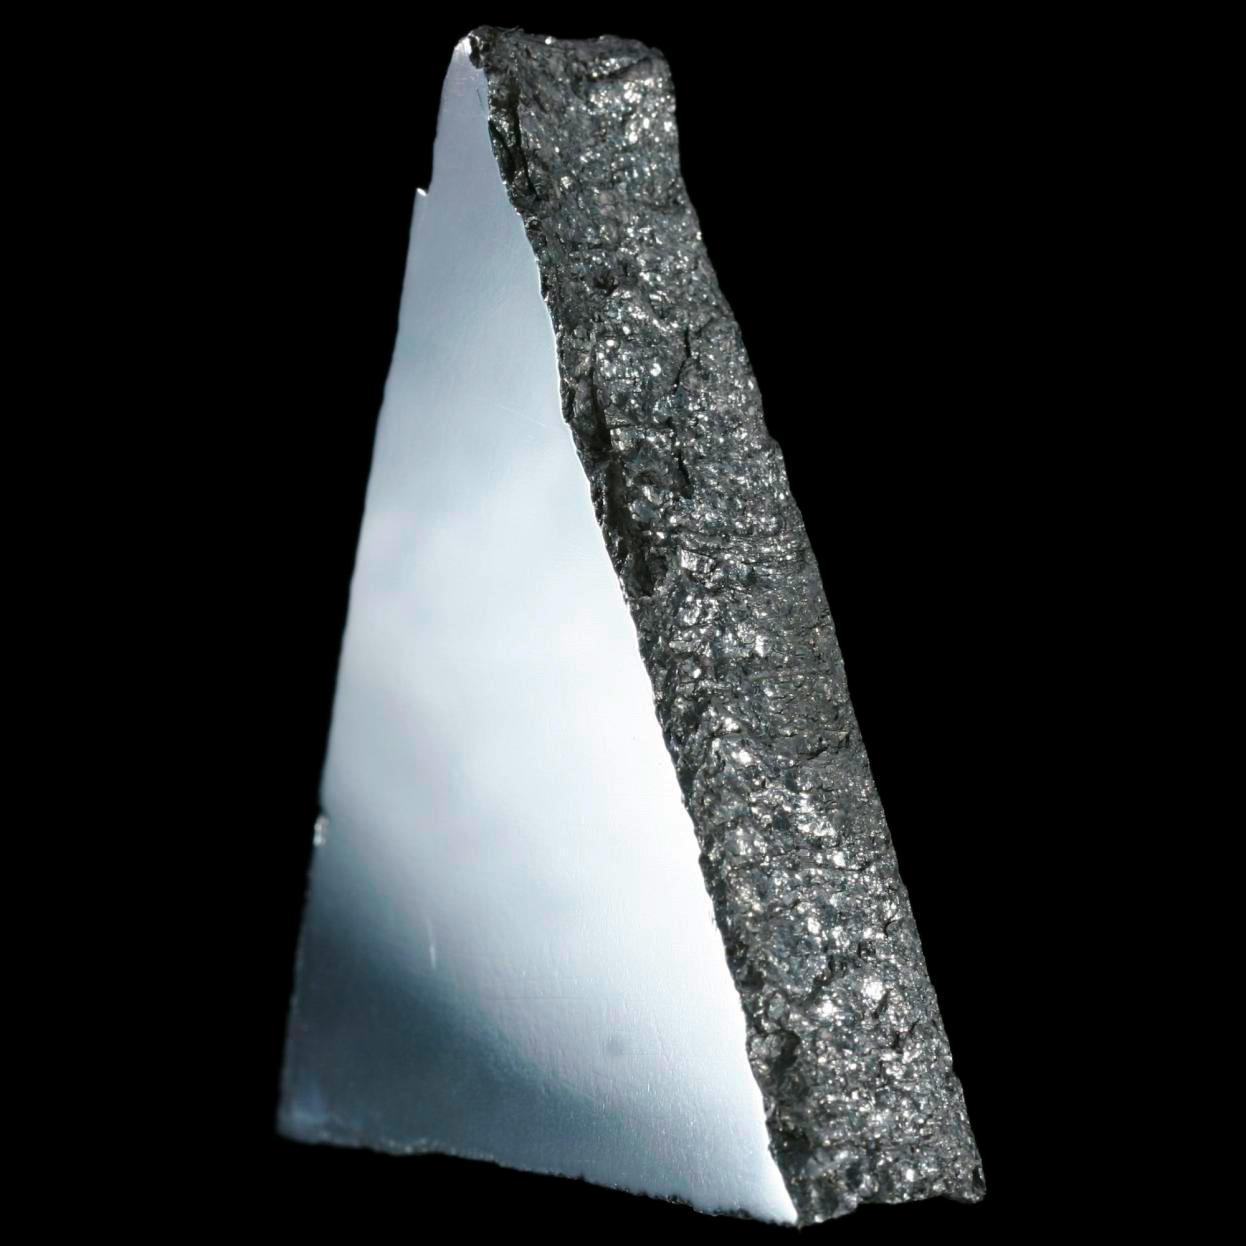 картинка металл хром звезд нравится своим